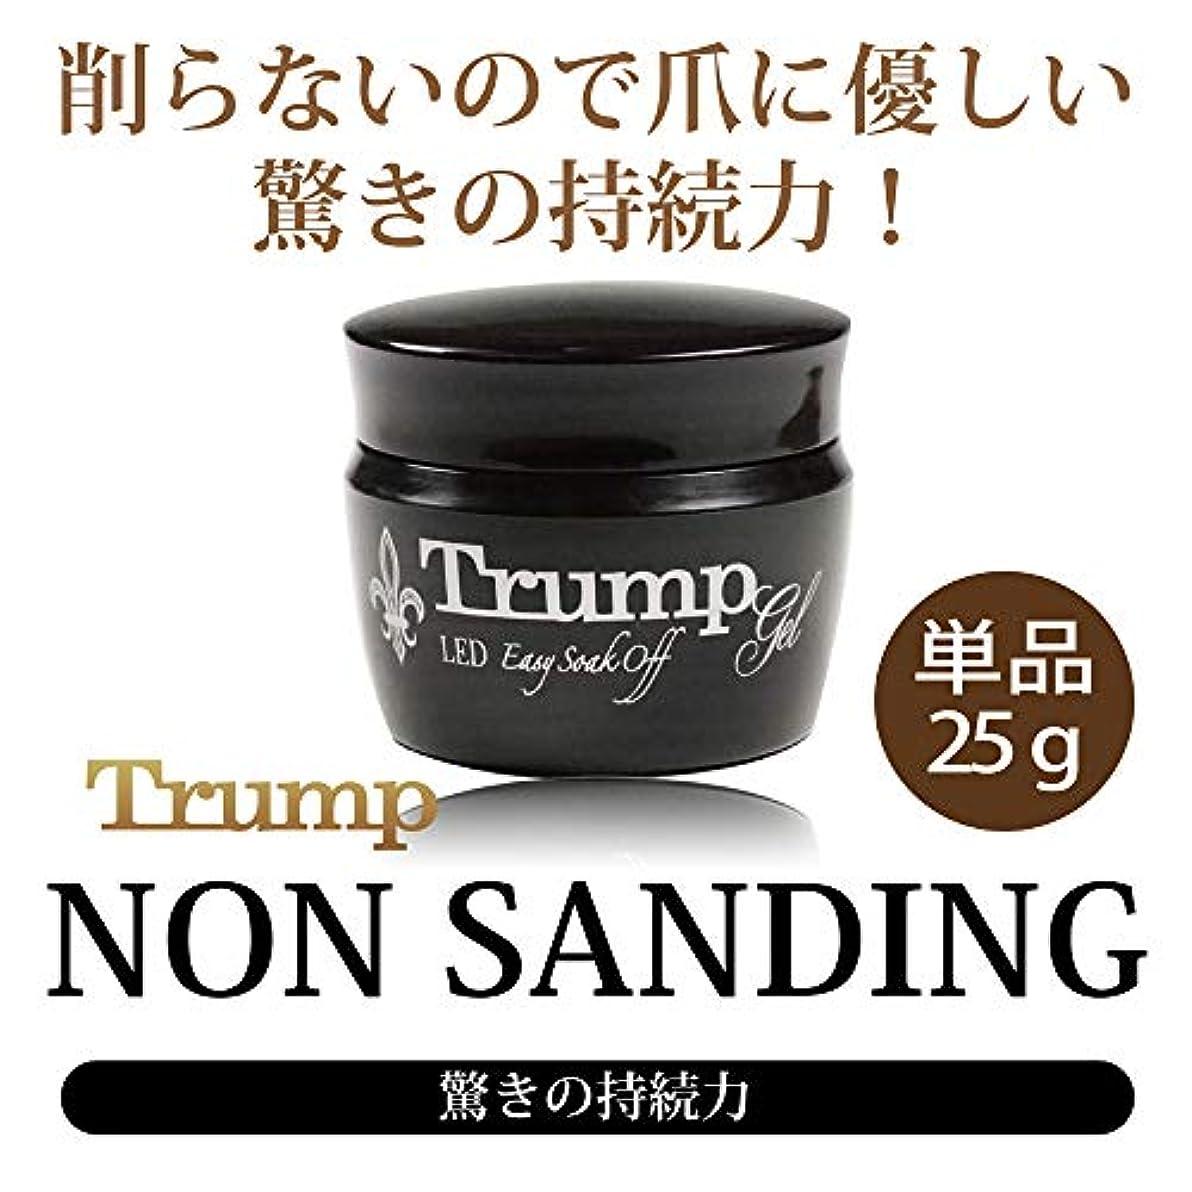 Trump ノンサンディング ベースジェル 25g